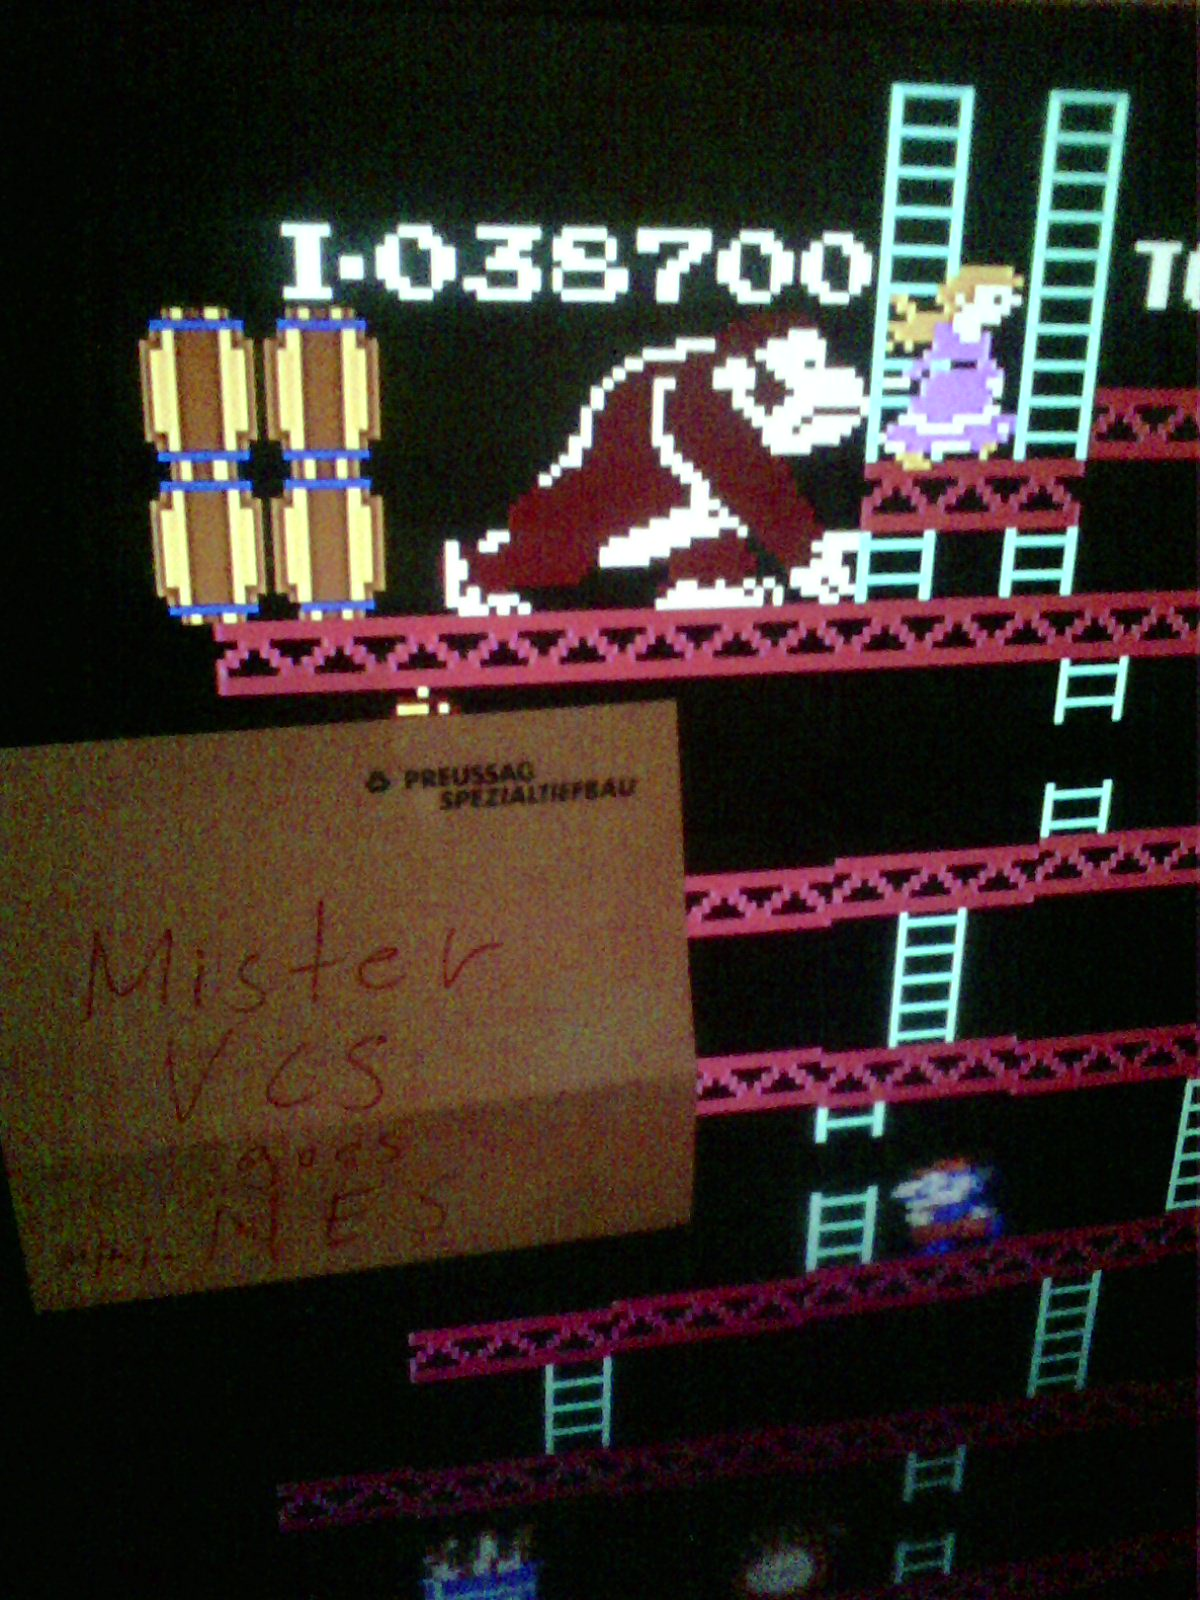 MisterVCS: Donkey Kong (NES/Famicom Emulated) 38,700 points on 2018-09-22 12:31:27